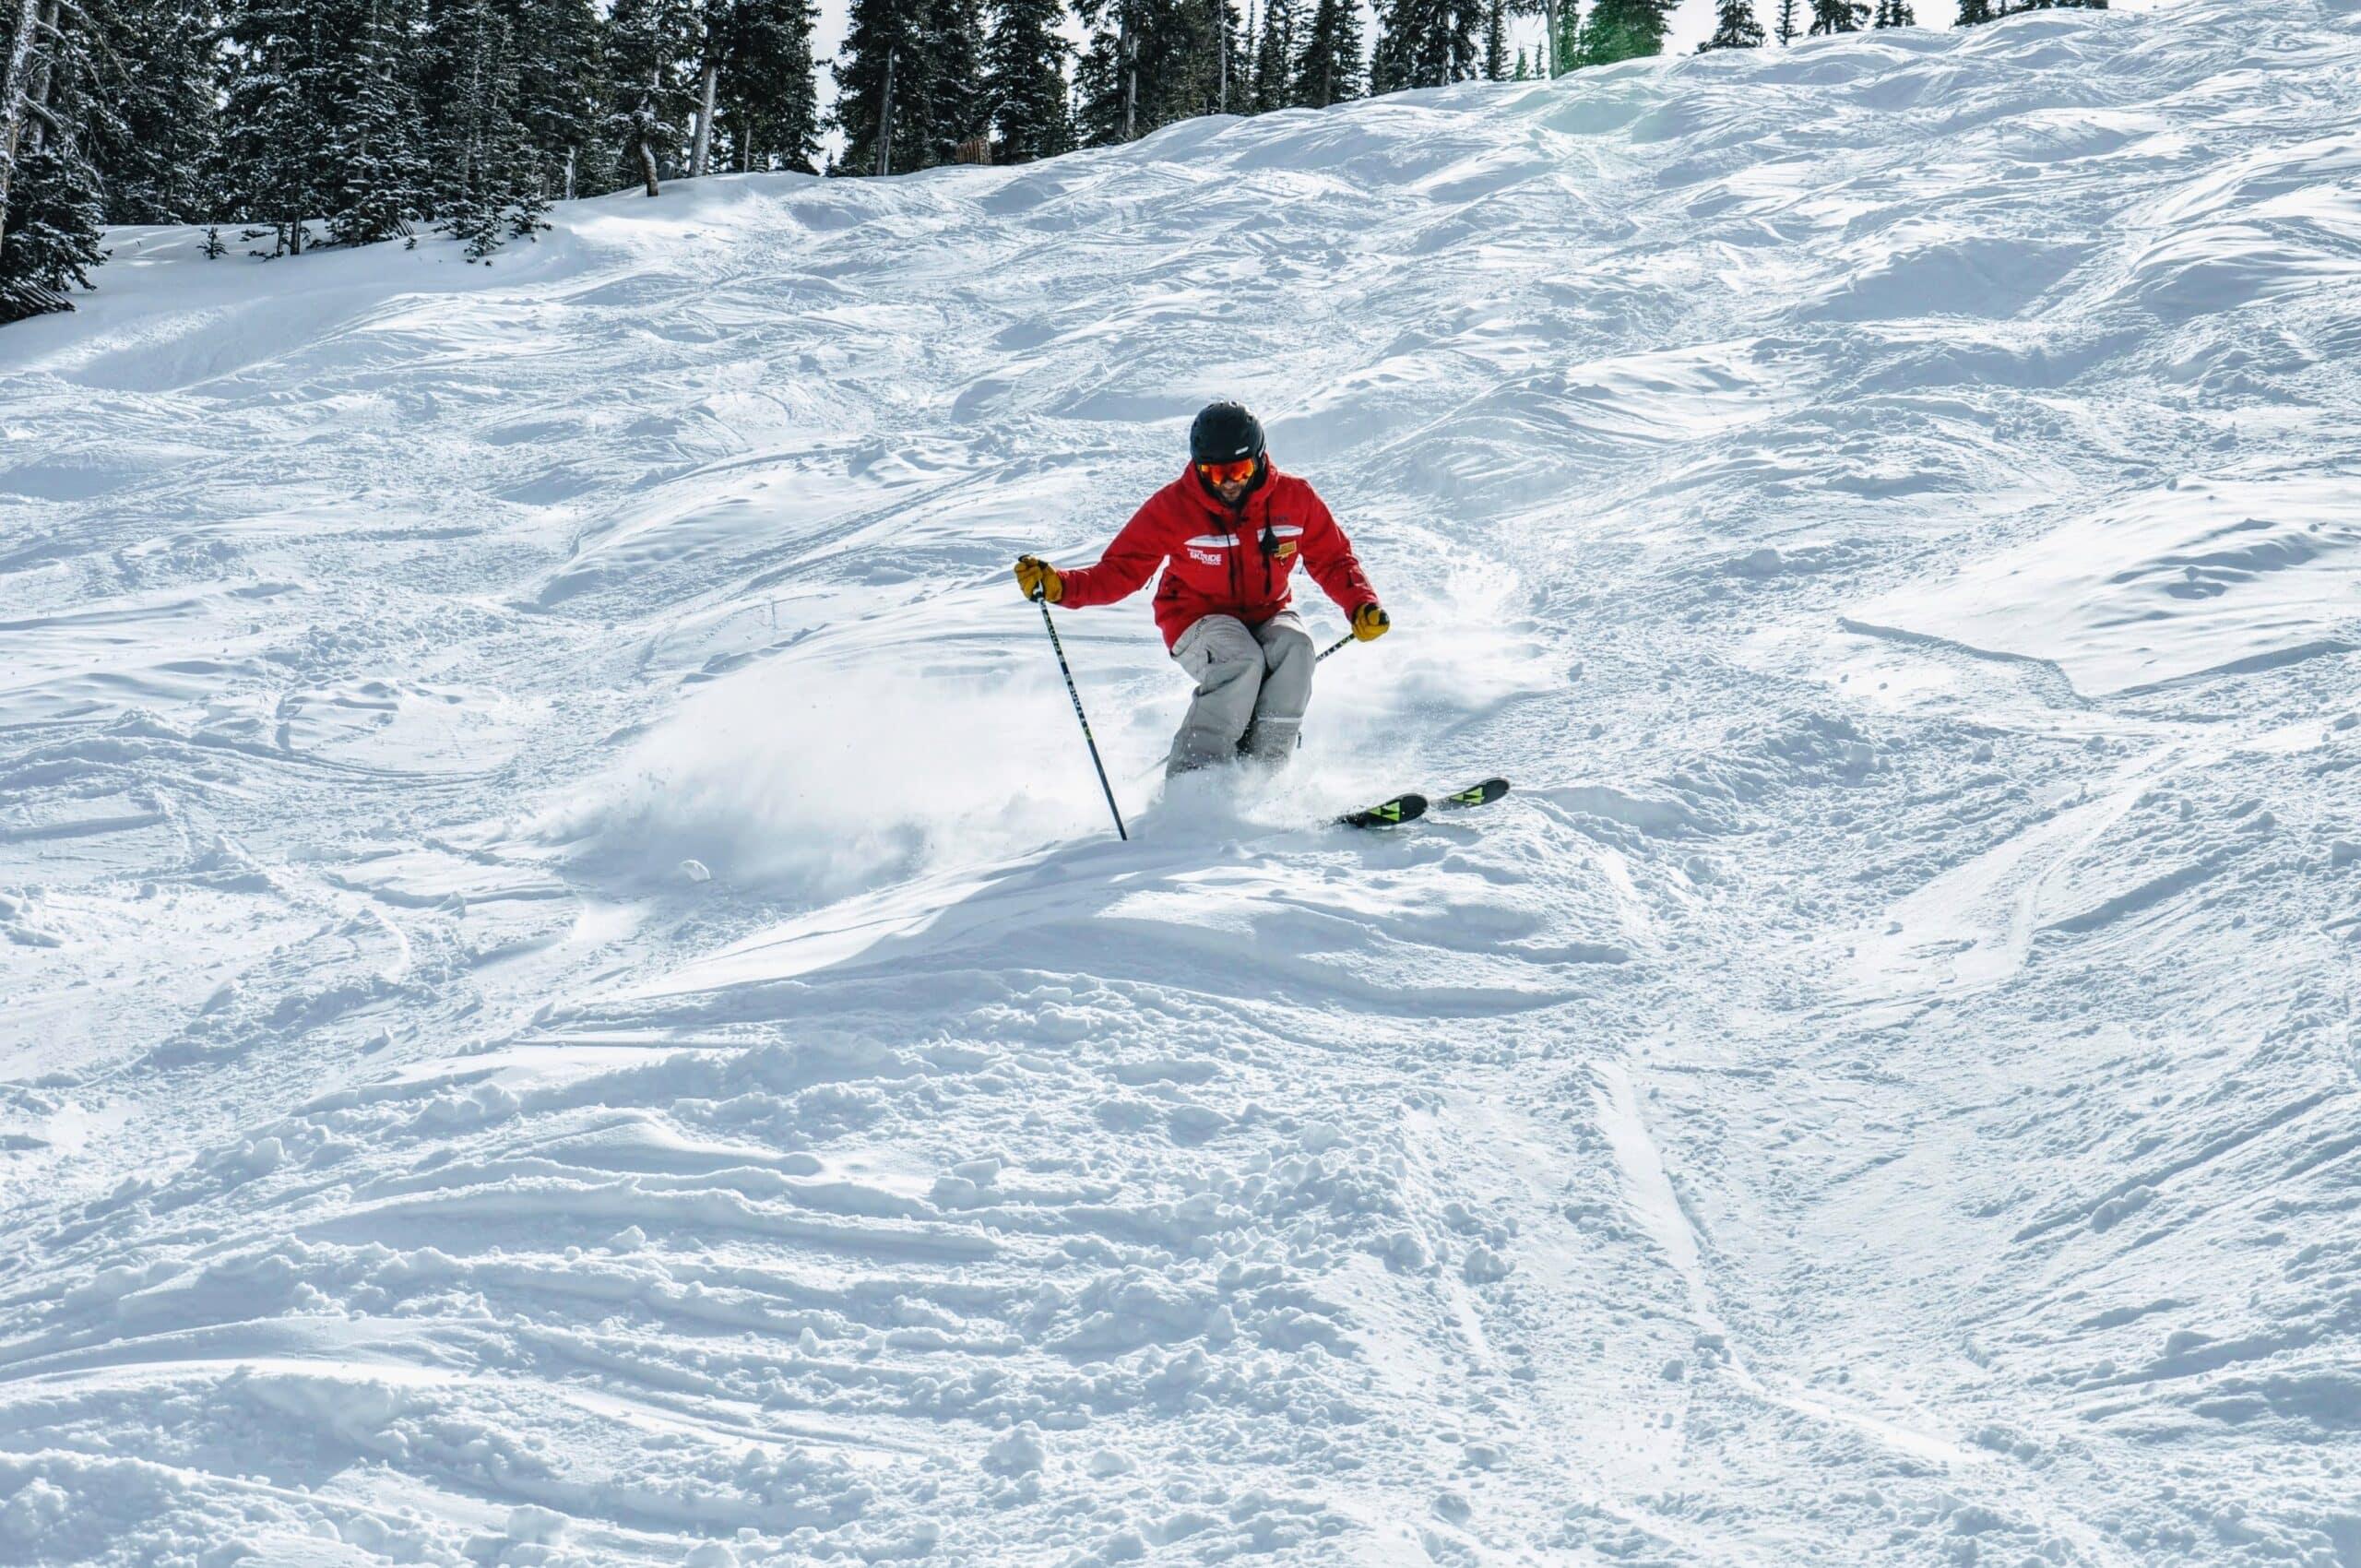 man skiing moguls with best mogul skis